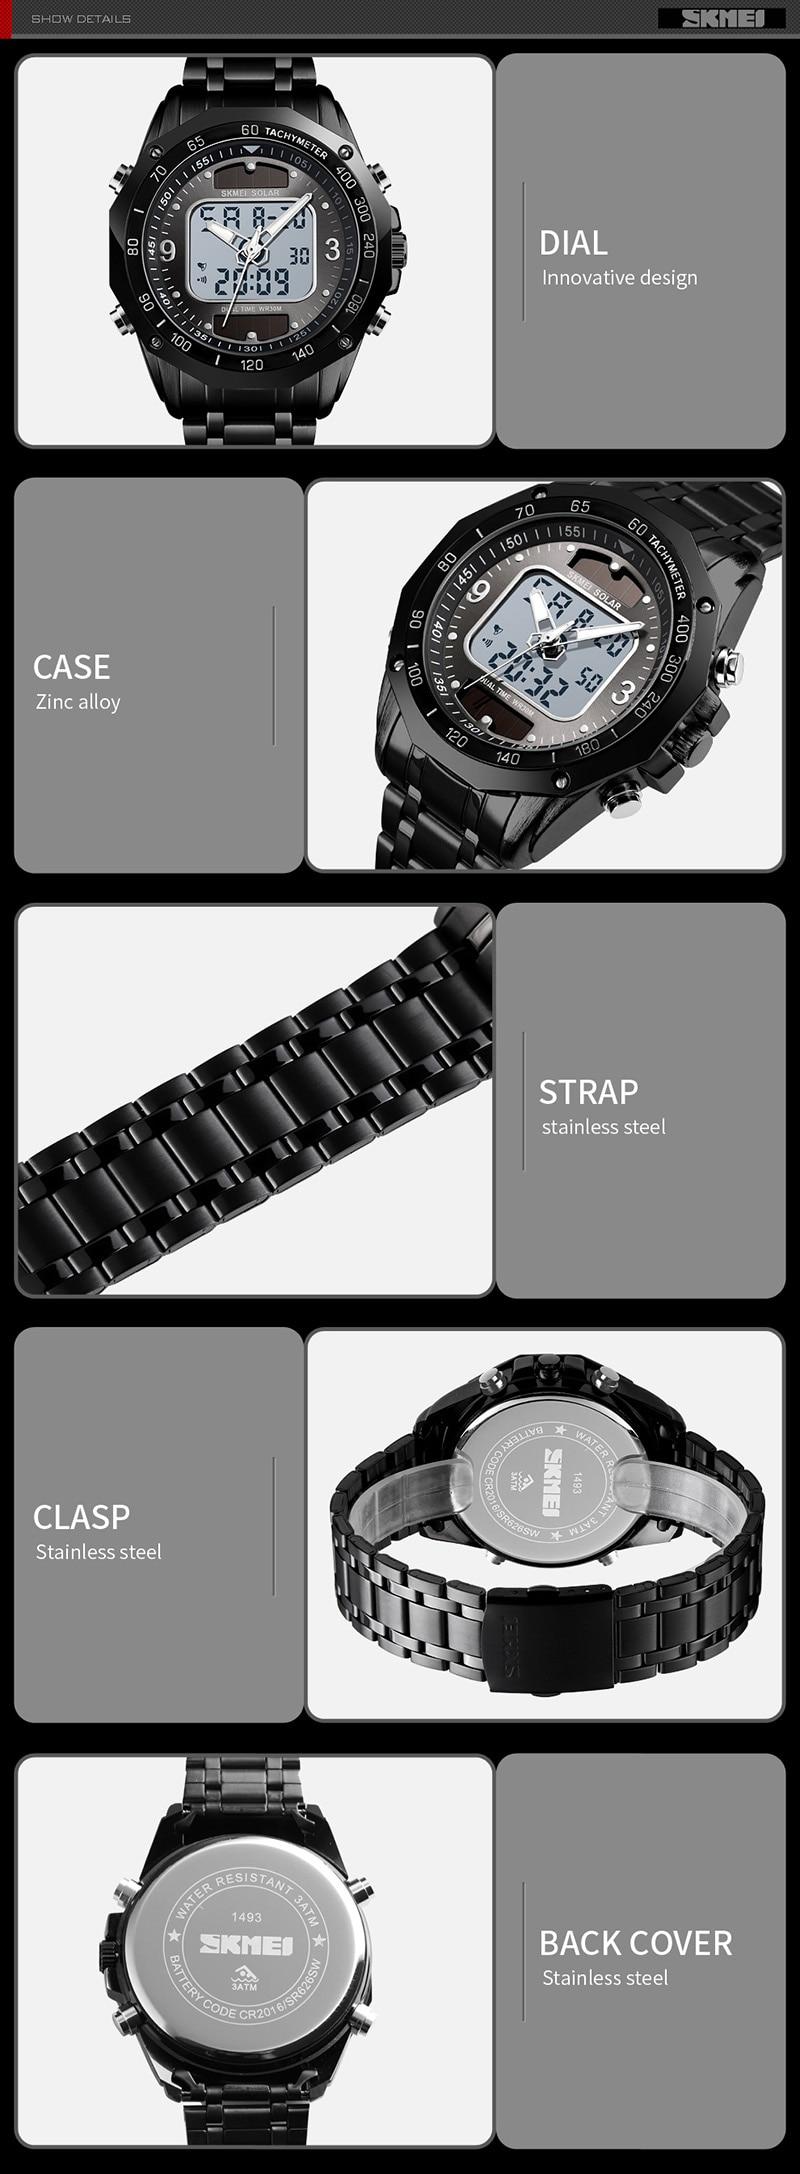 HTB1VlecUMHqK1RjSZFEq6AGMXXaN Solar Men Military Sport Watches Men's Digital Quartz Clock Full Steel Waterproof Wrist Watch relojes hombre 2019 SKMEI